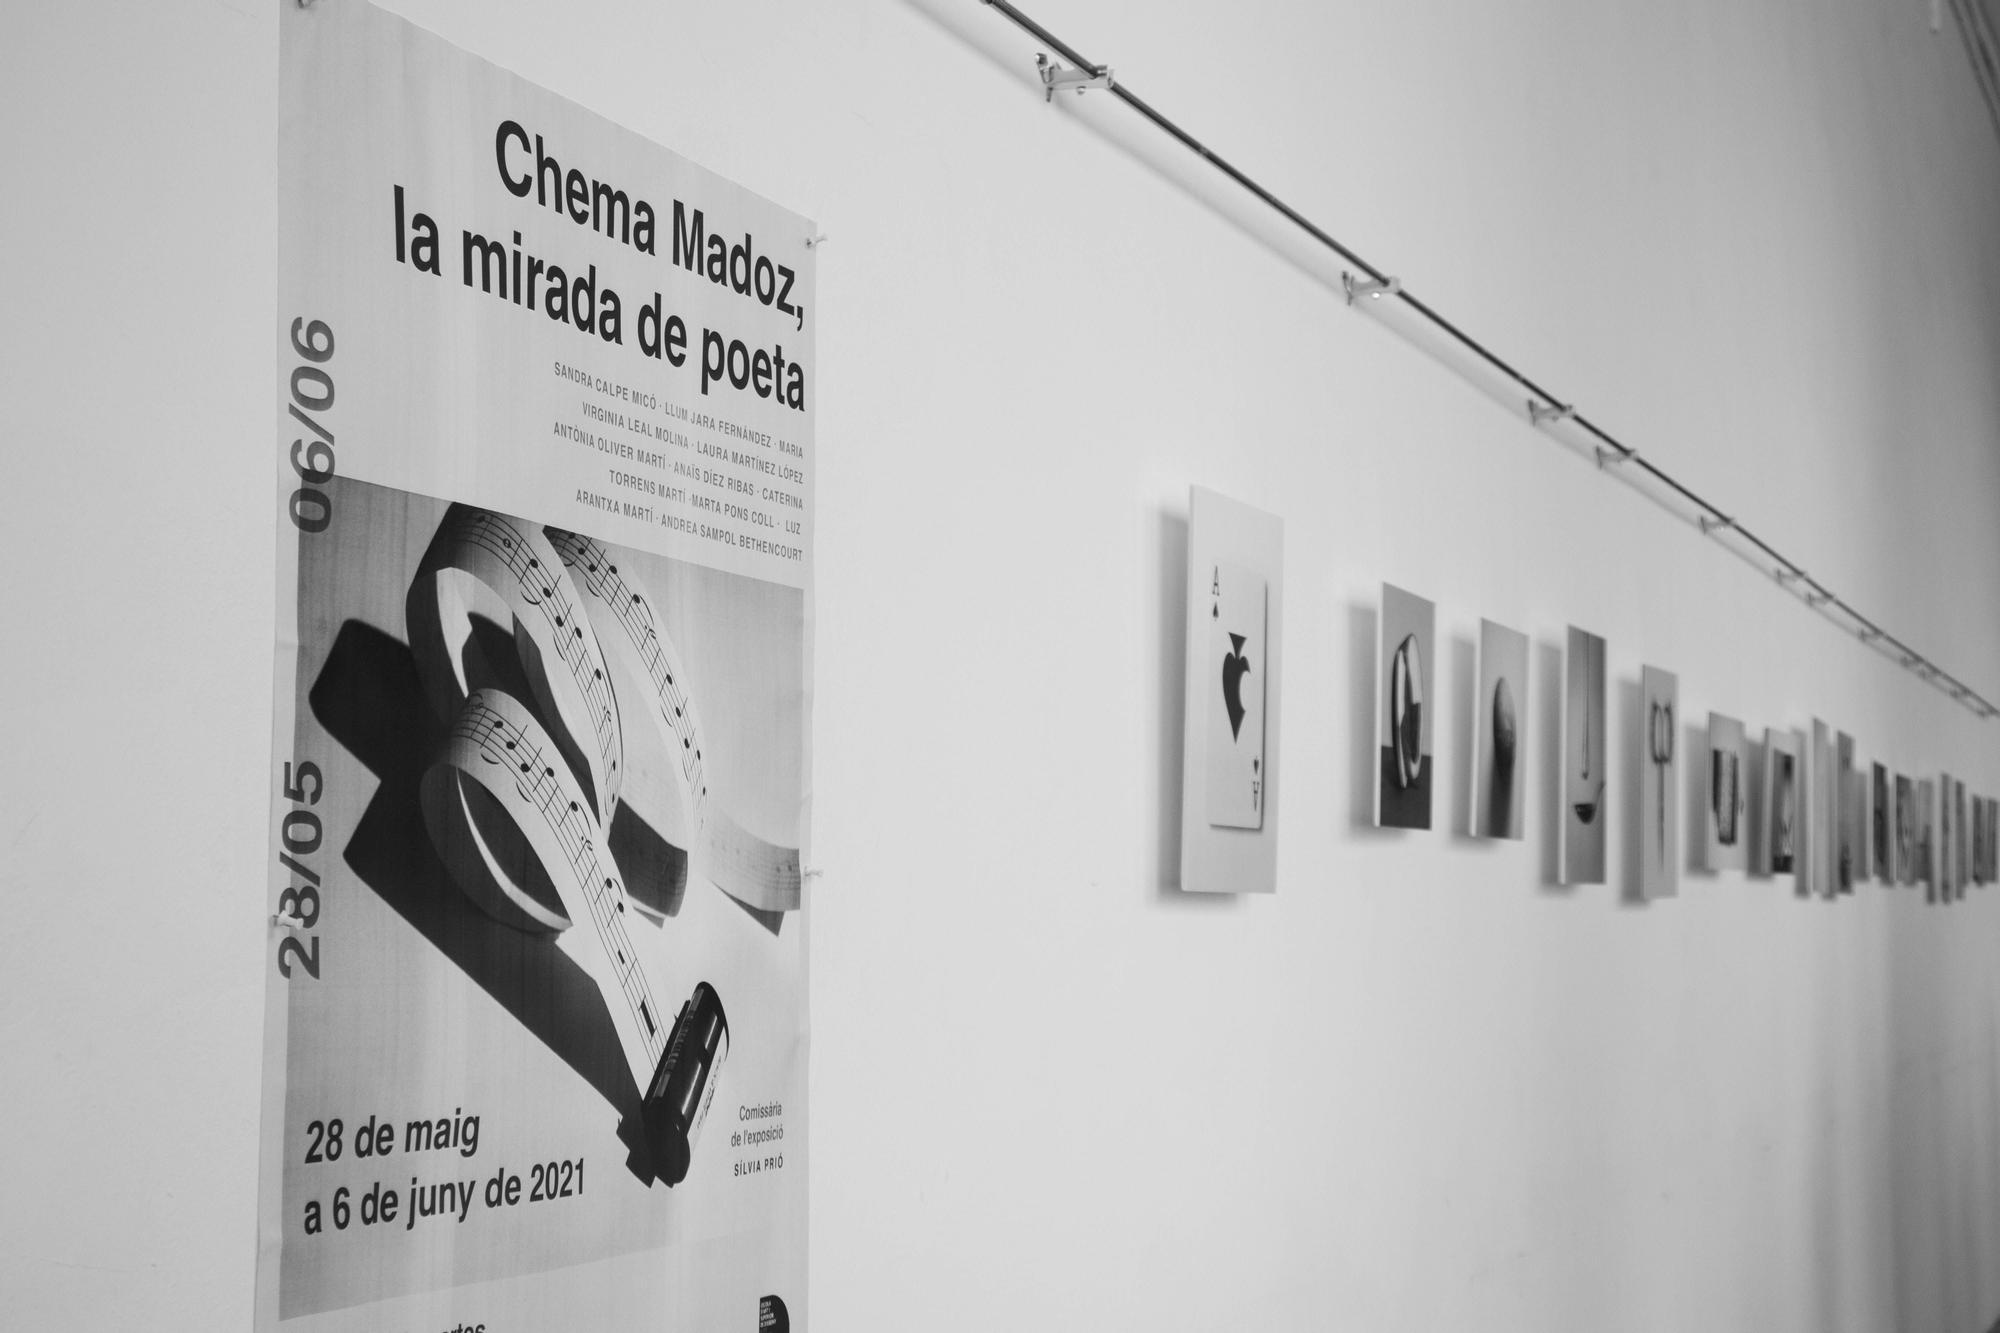 Colectiva dedicada a Chema Madoz